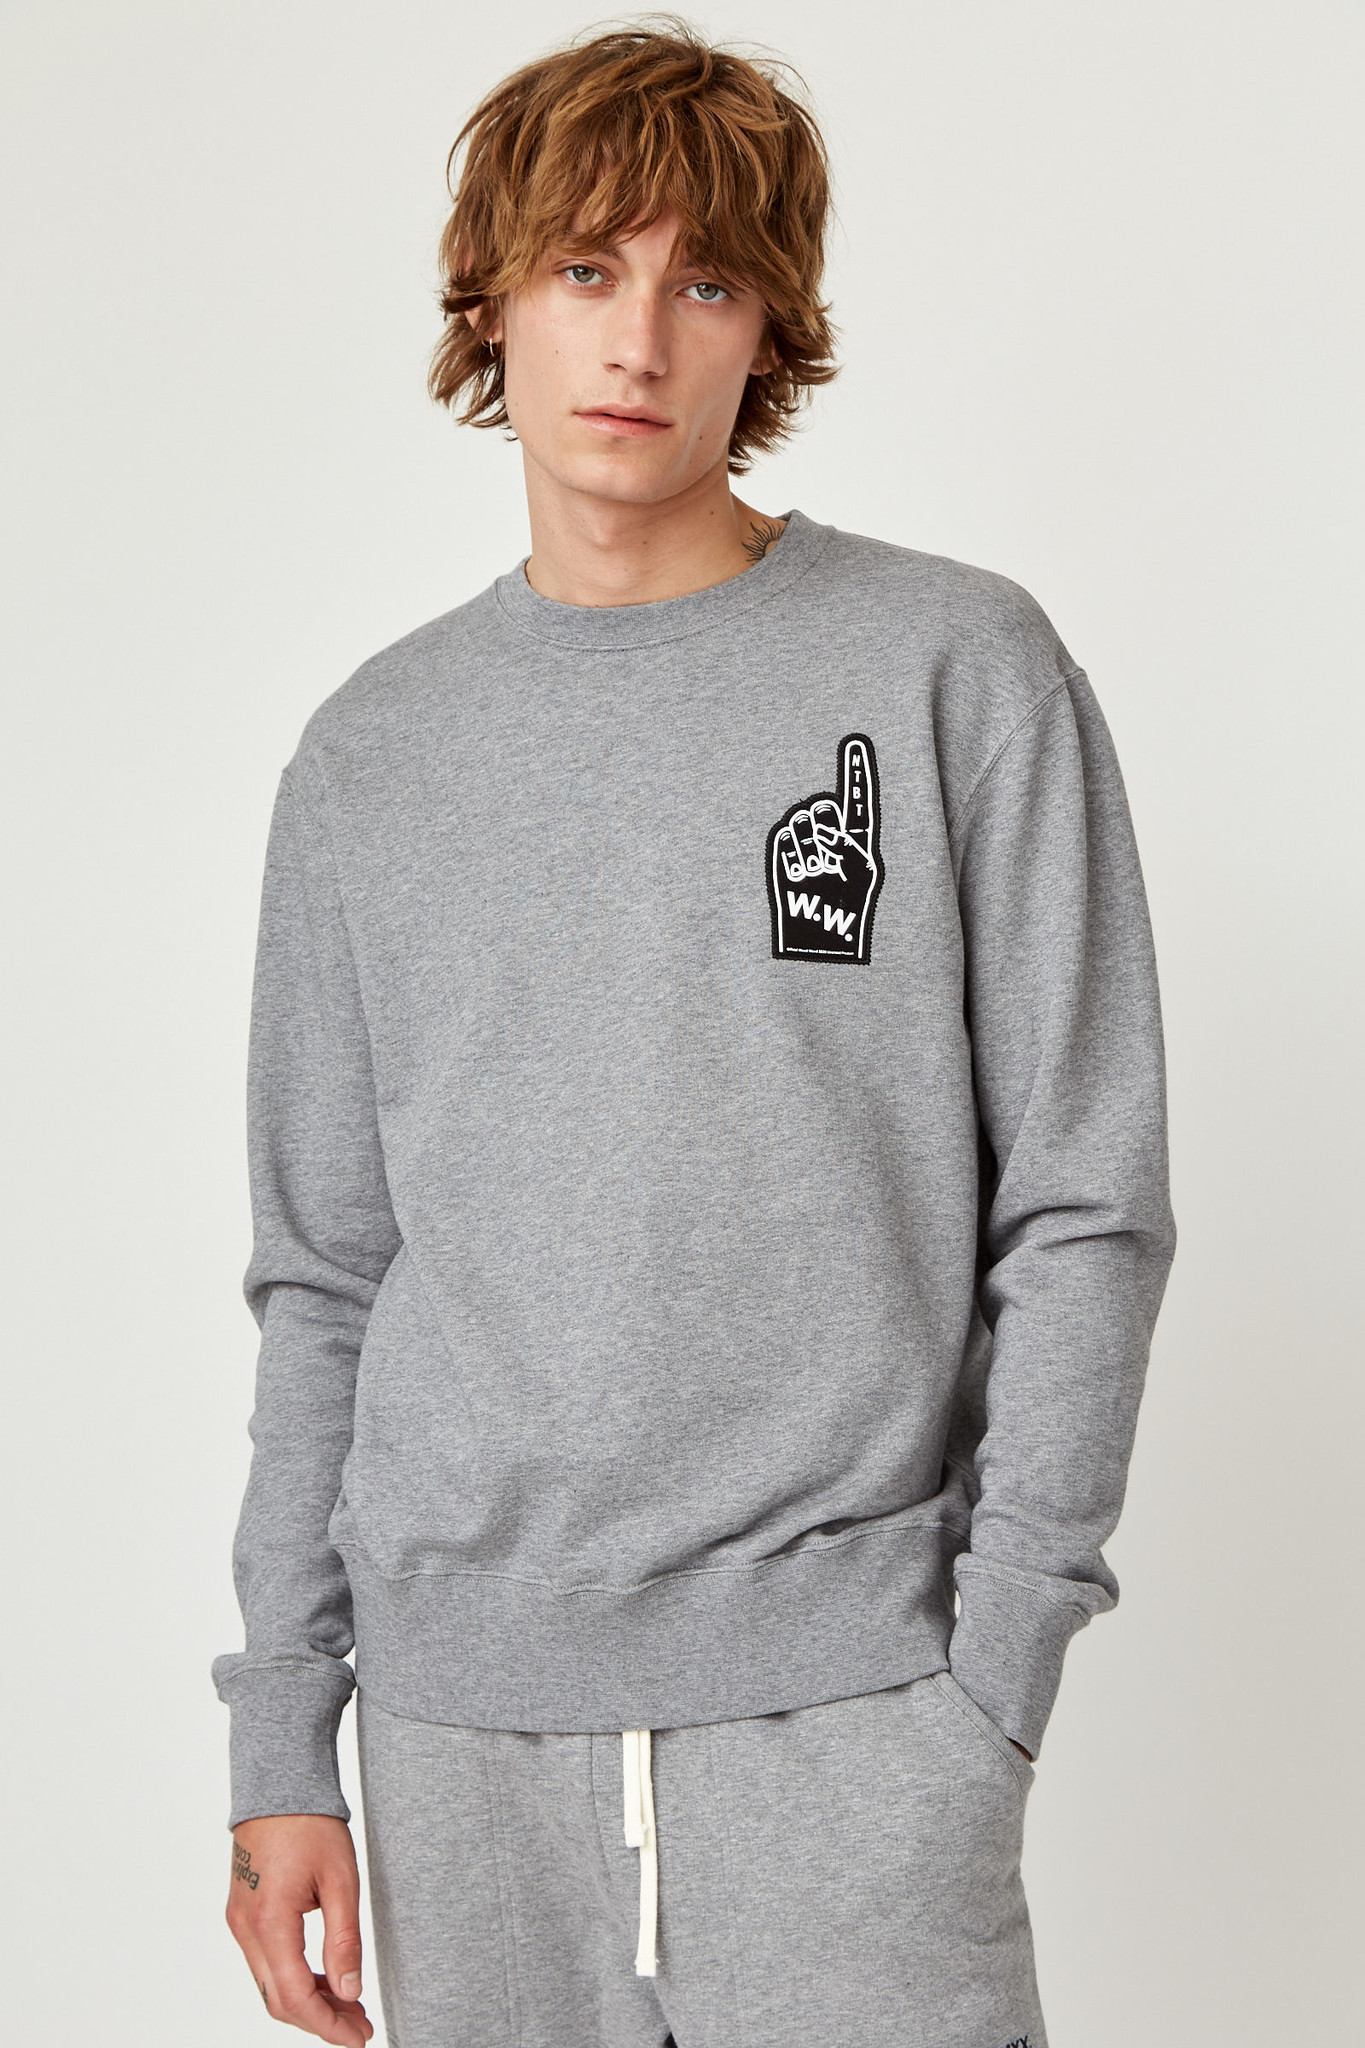 Hugh Sweatshirt Grey Melange Unisex-6